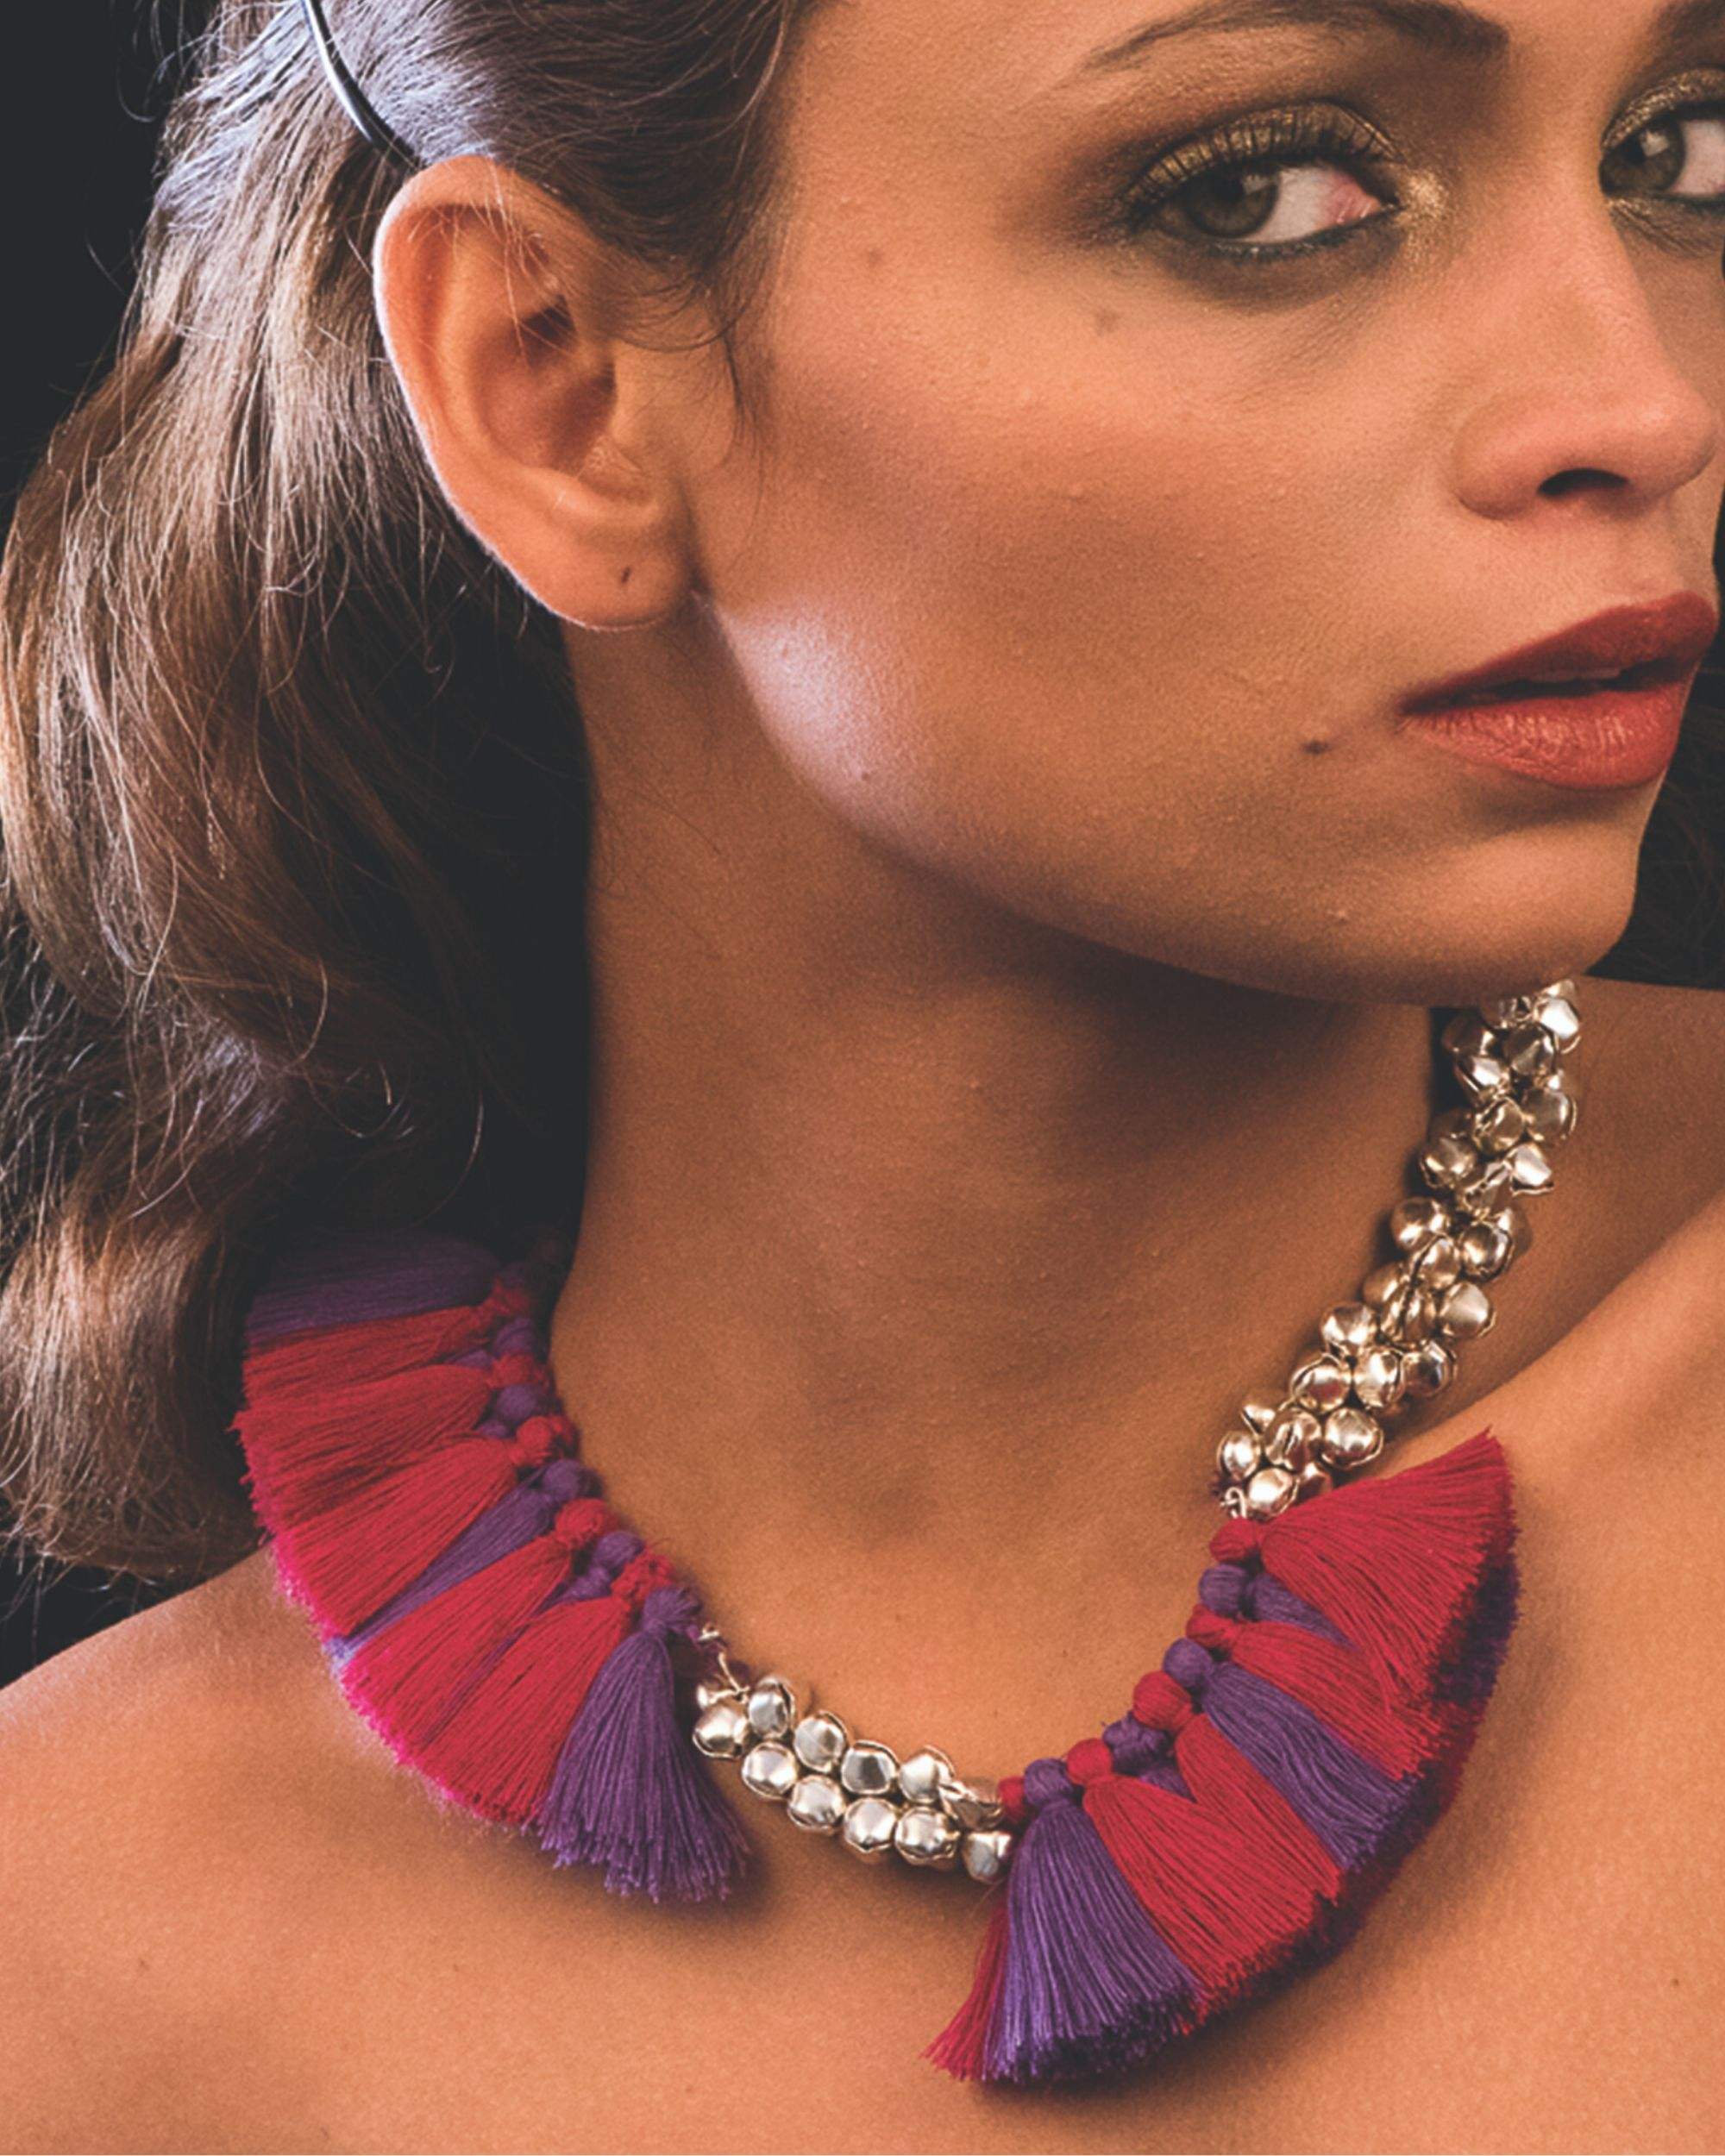 Pink and purple tassel neckpiece